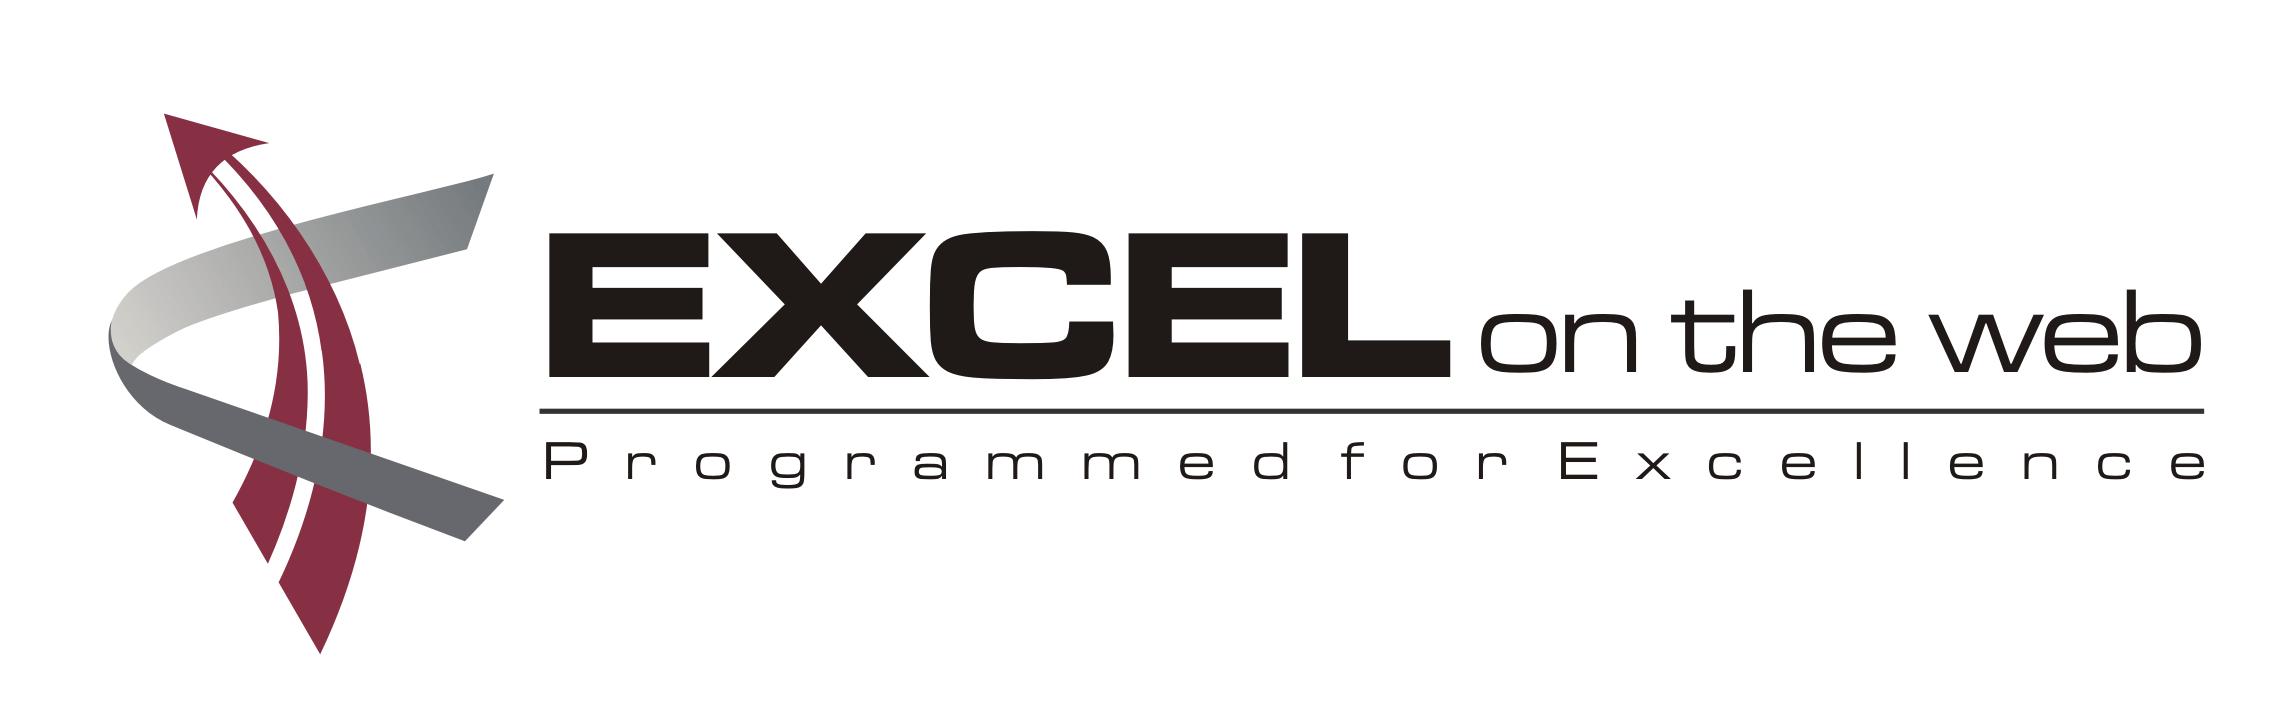 Sponsor EXCEL on the web